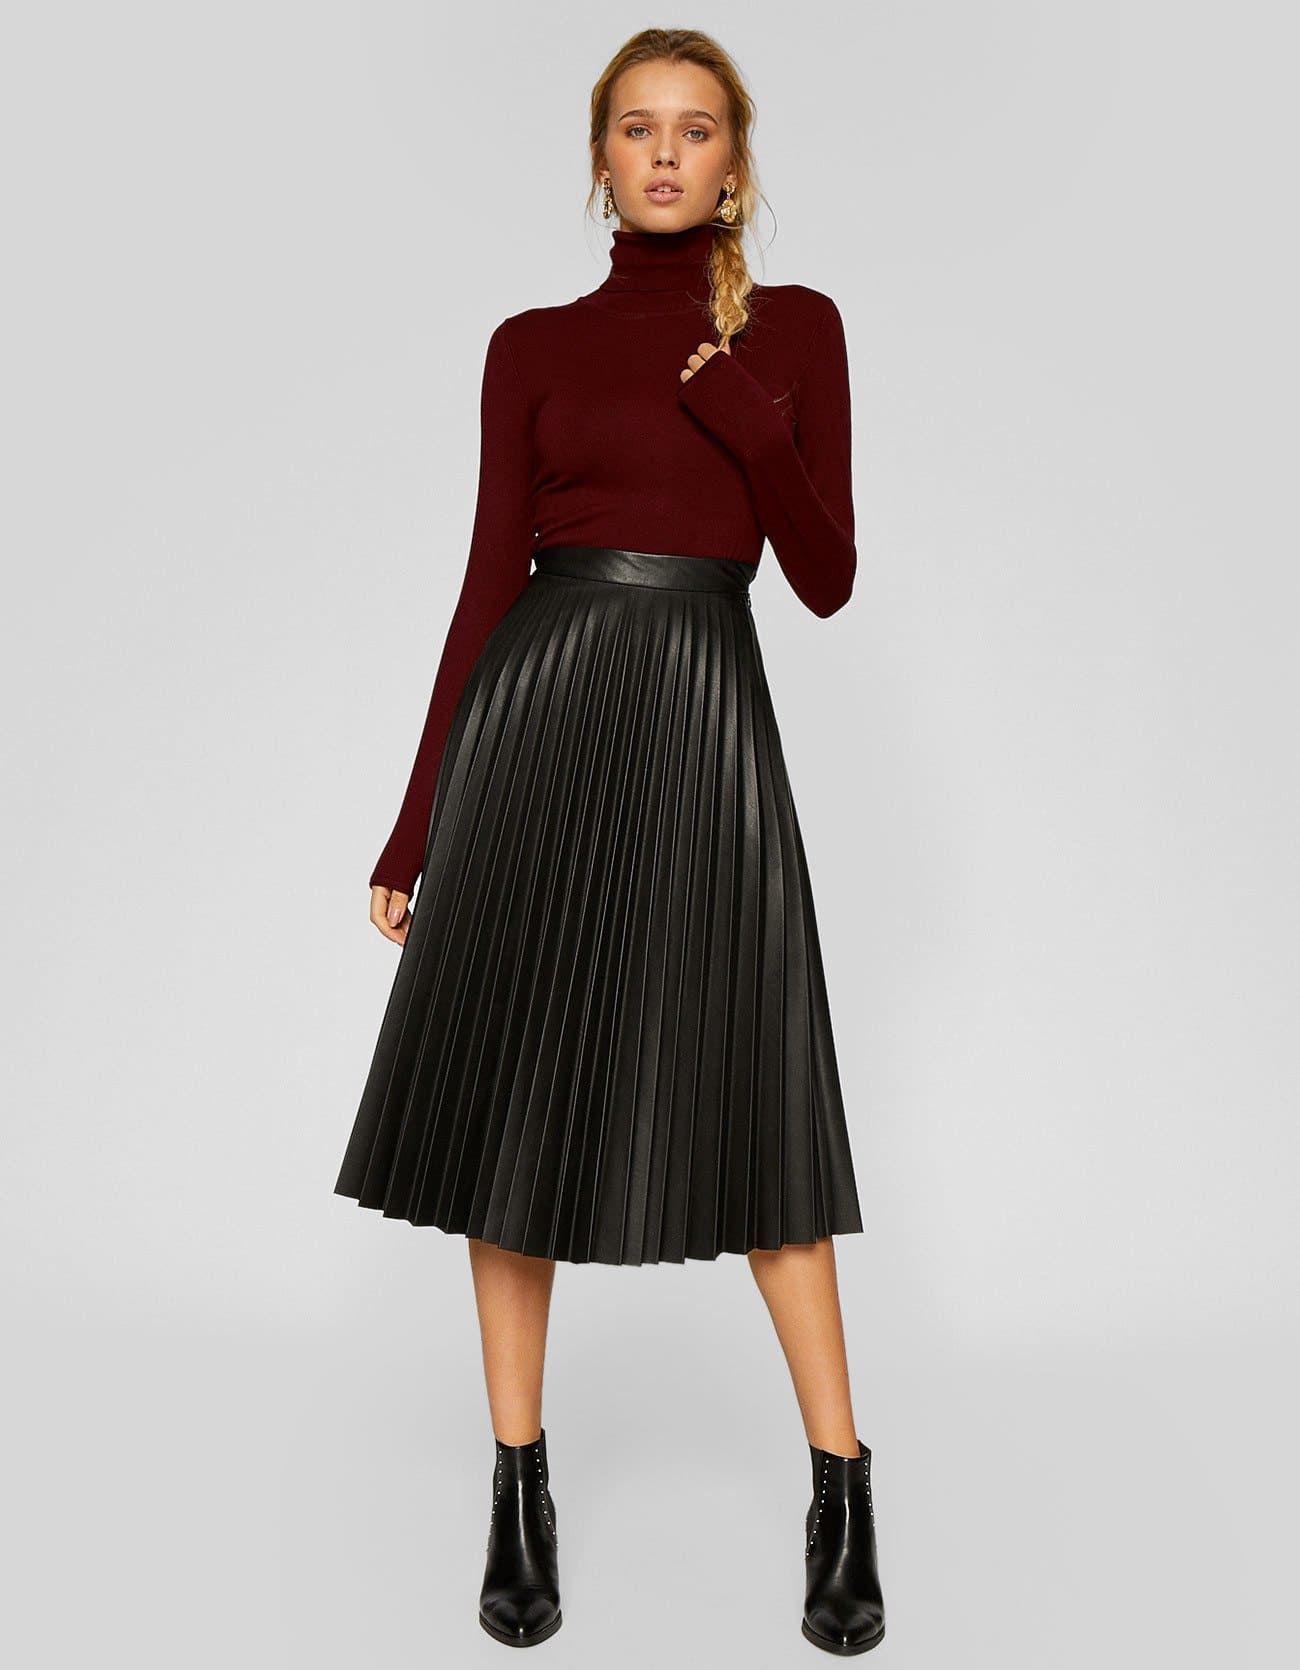 676aa13fc Falda plisada STR   wear. en 2019   Faldas plisadas, Falda plisada ...